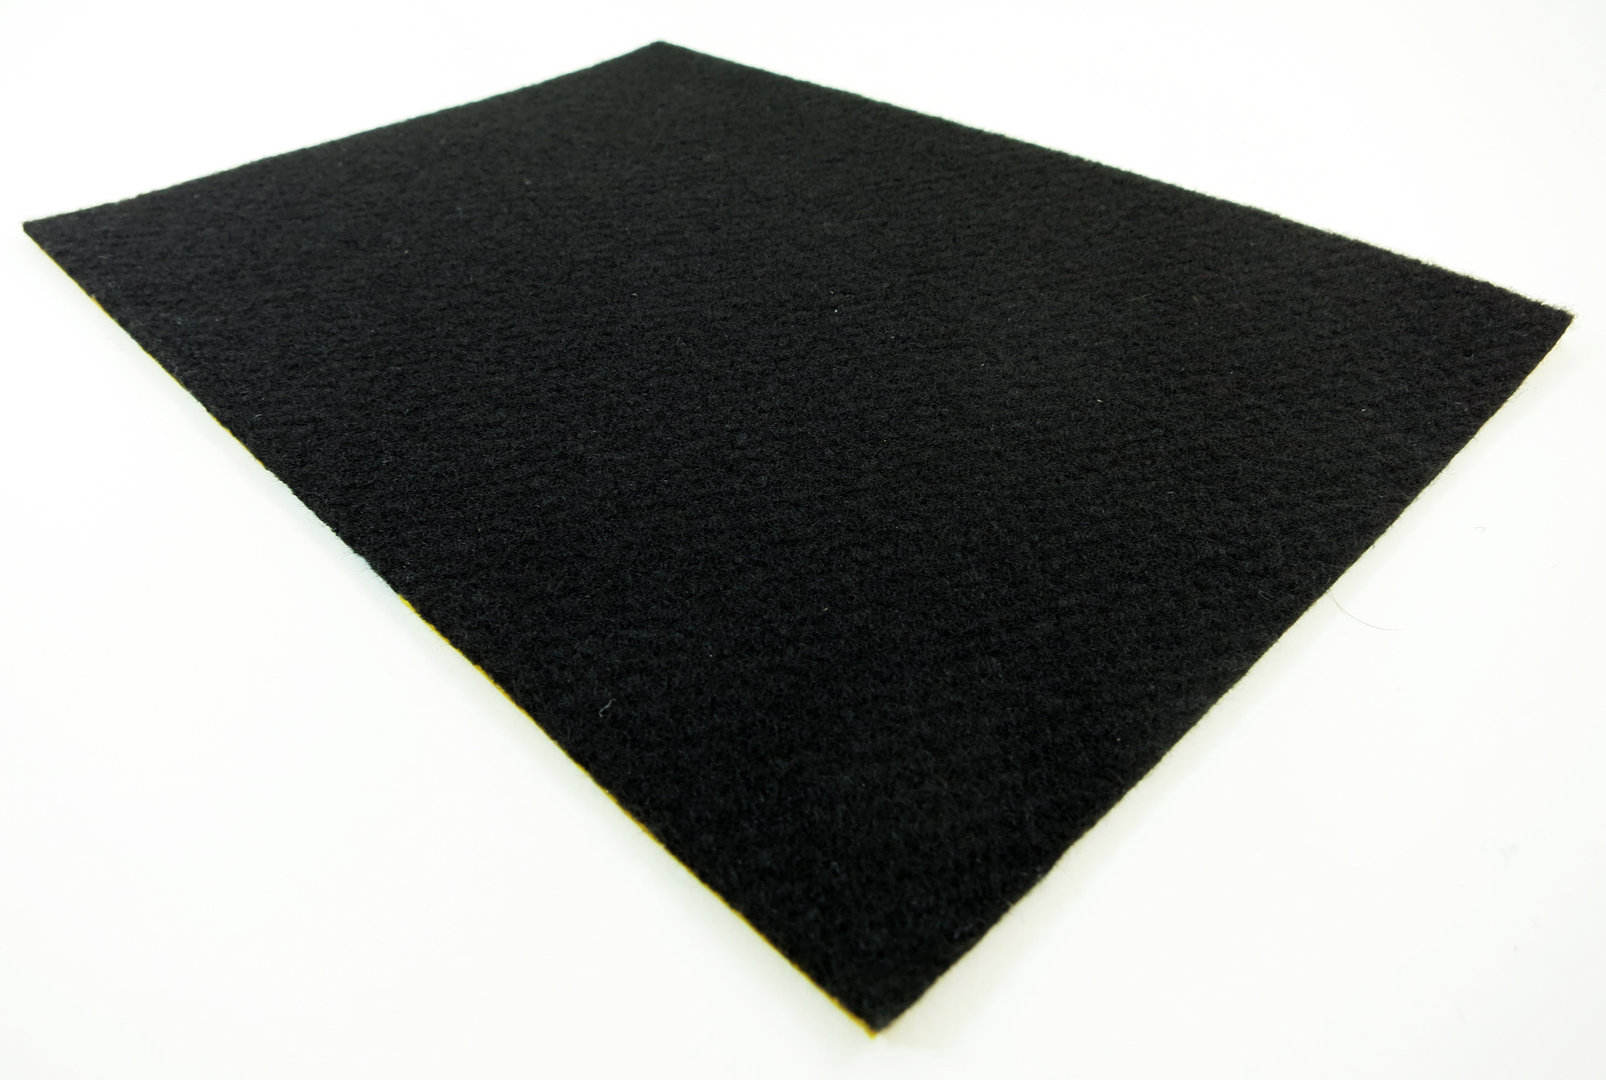 Filzplatte selbstklebend - DIN Formate 2mm dick | schwarz, anthrazit